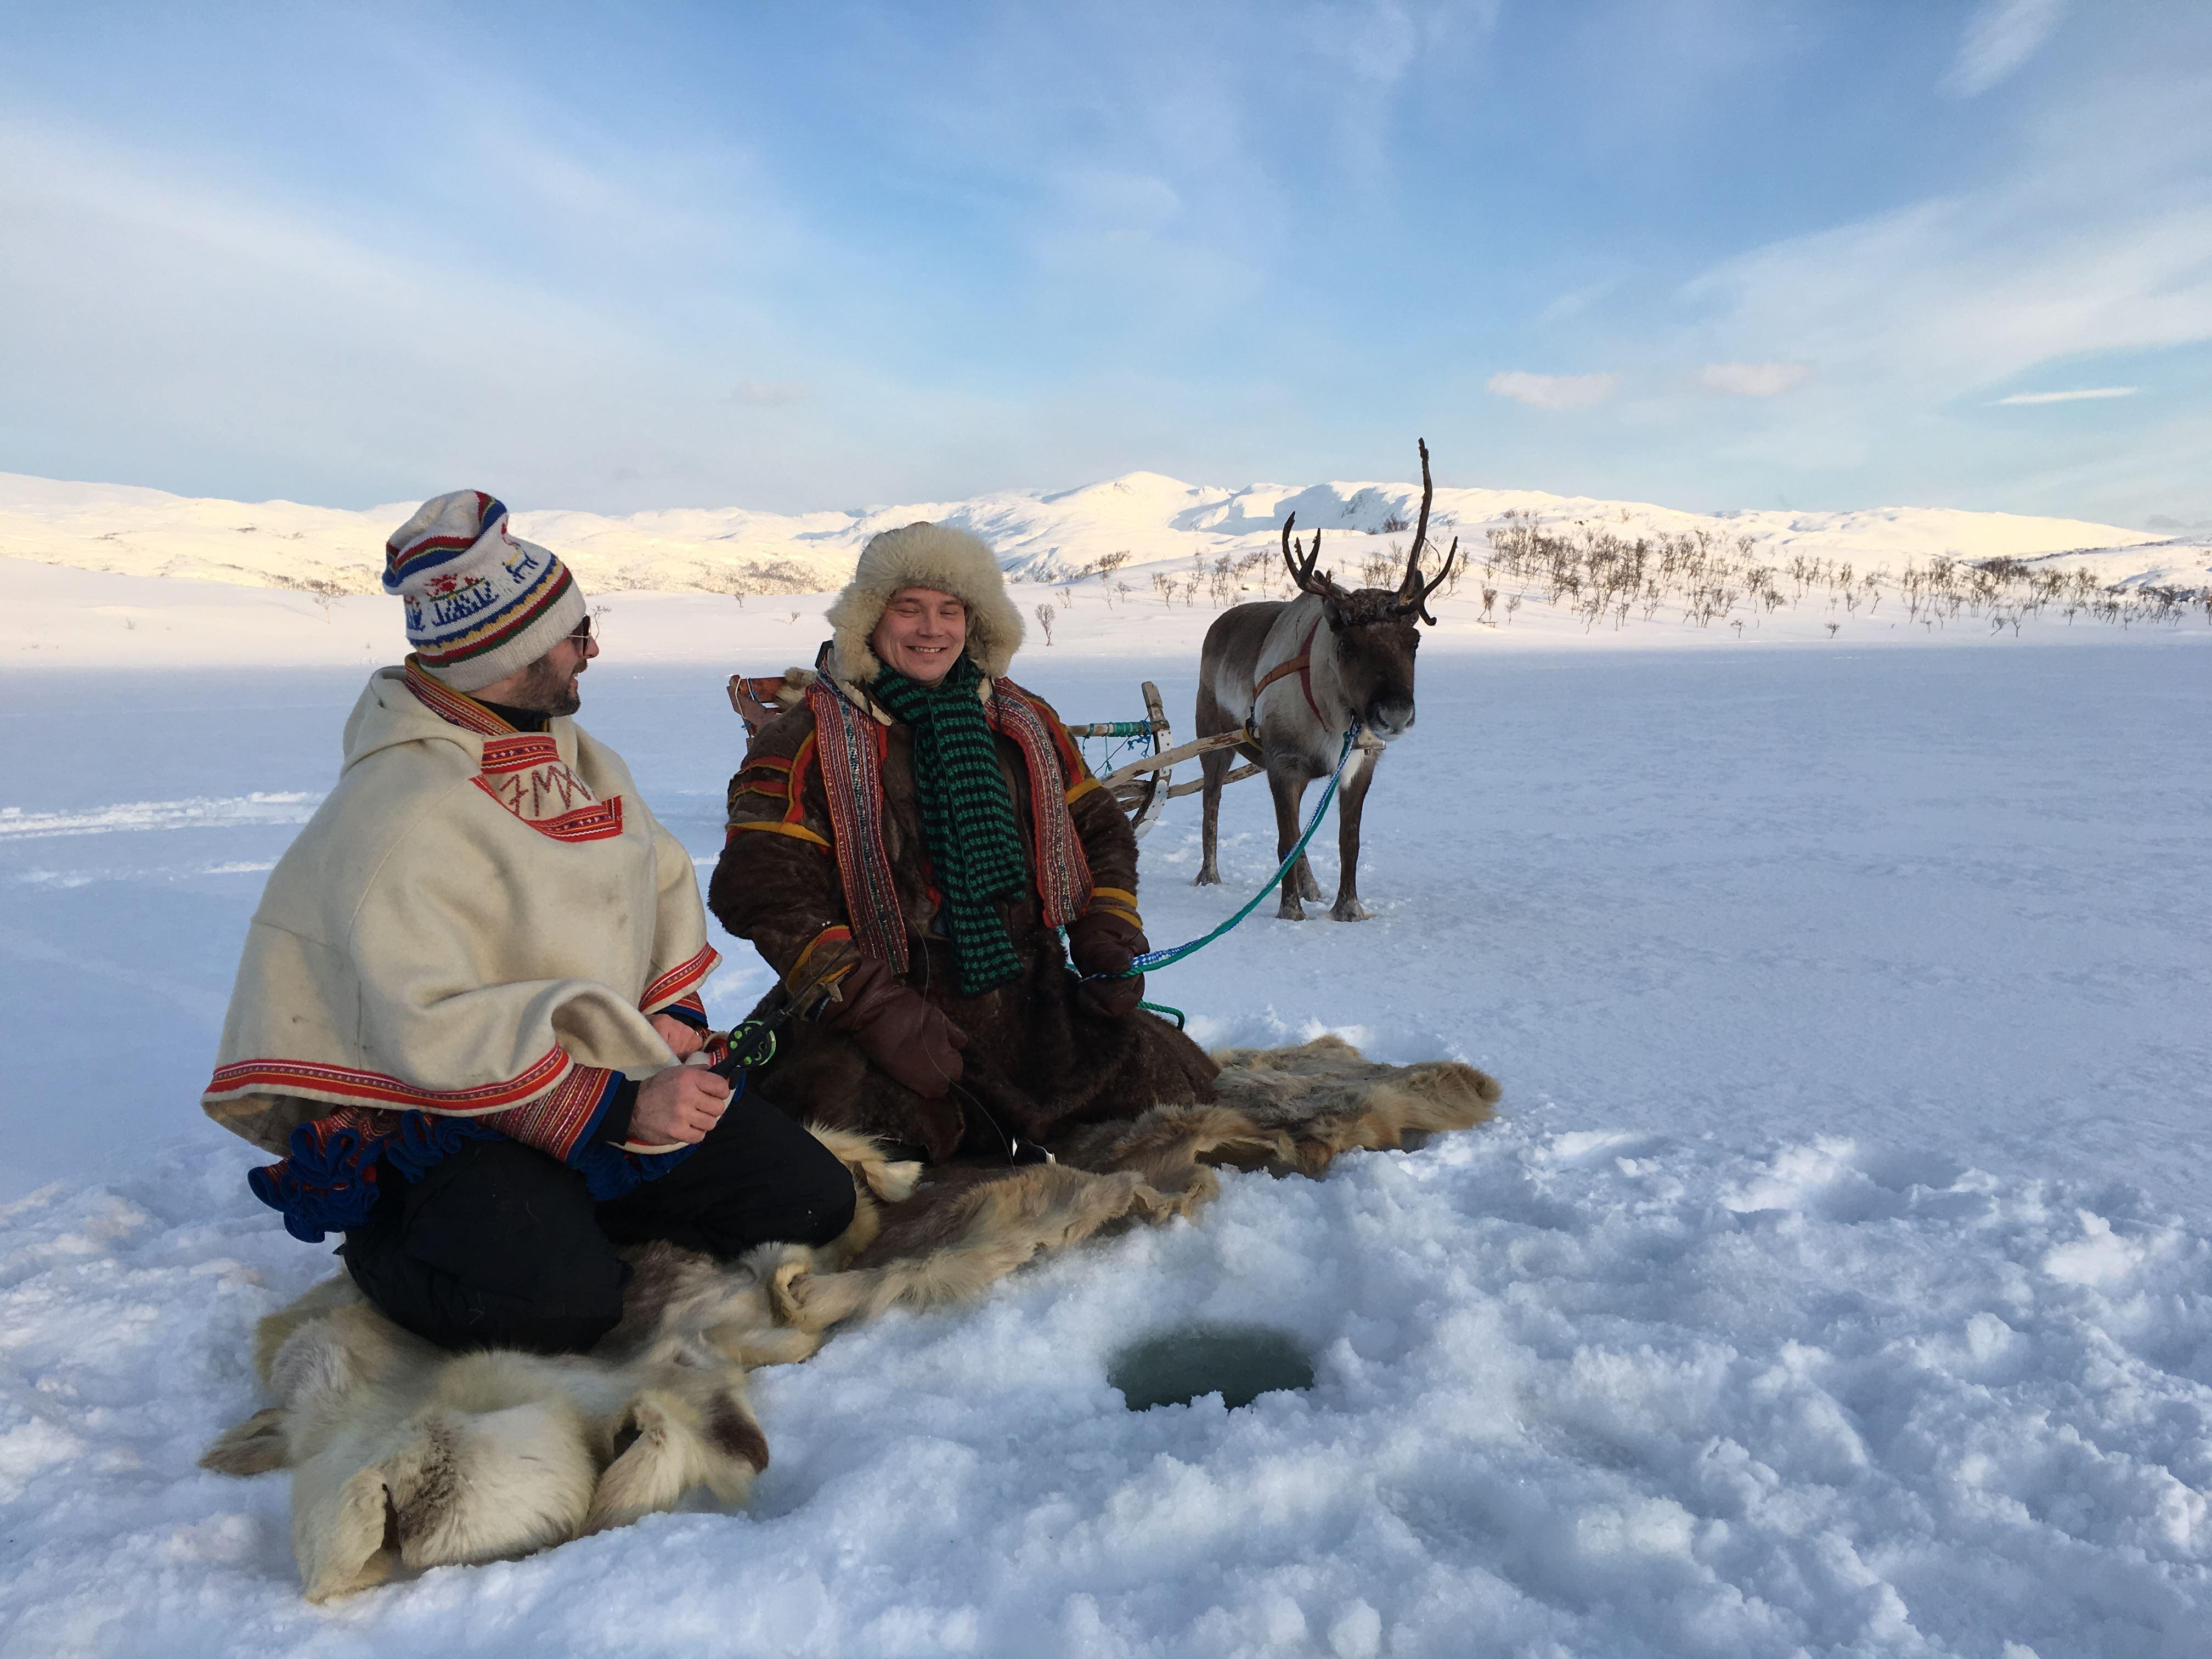 Ice Fishing at the Dankarvåg Nature Reserve– Sami Adventure